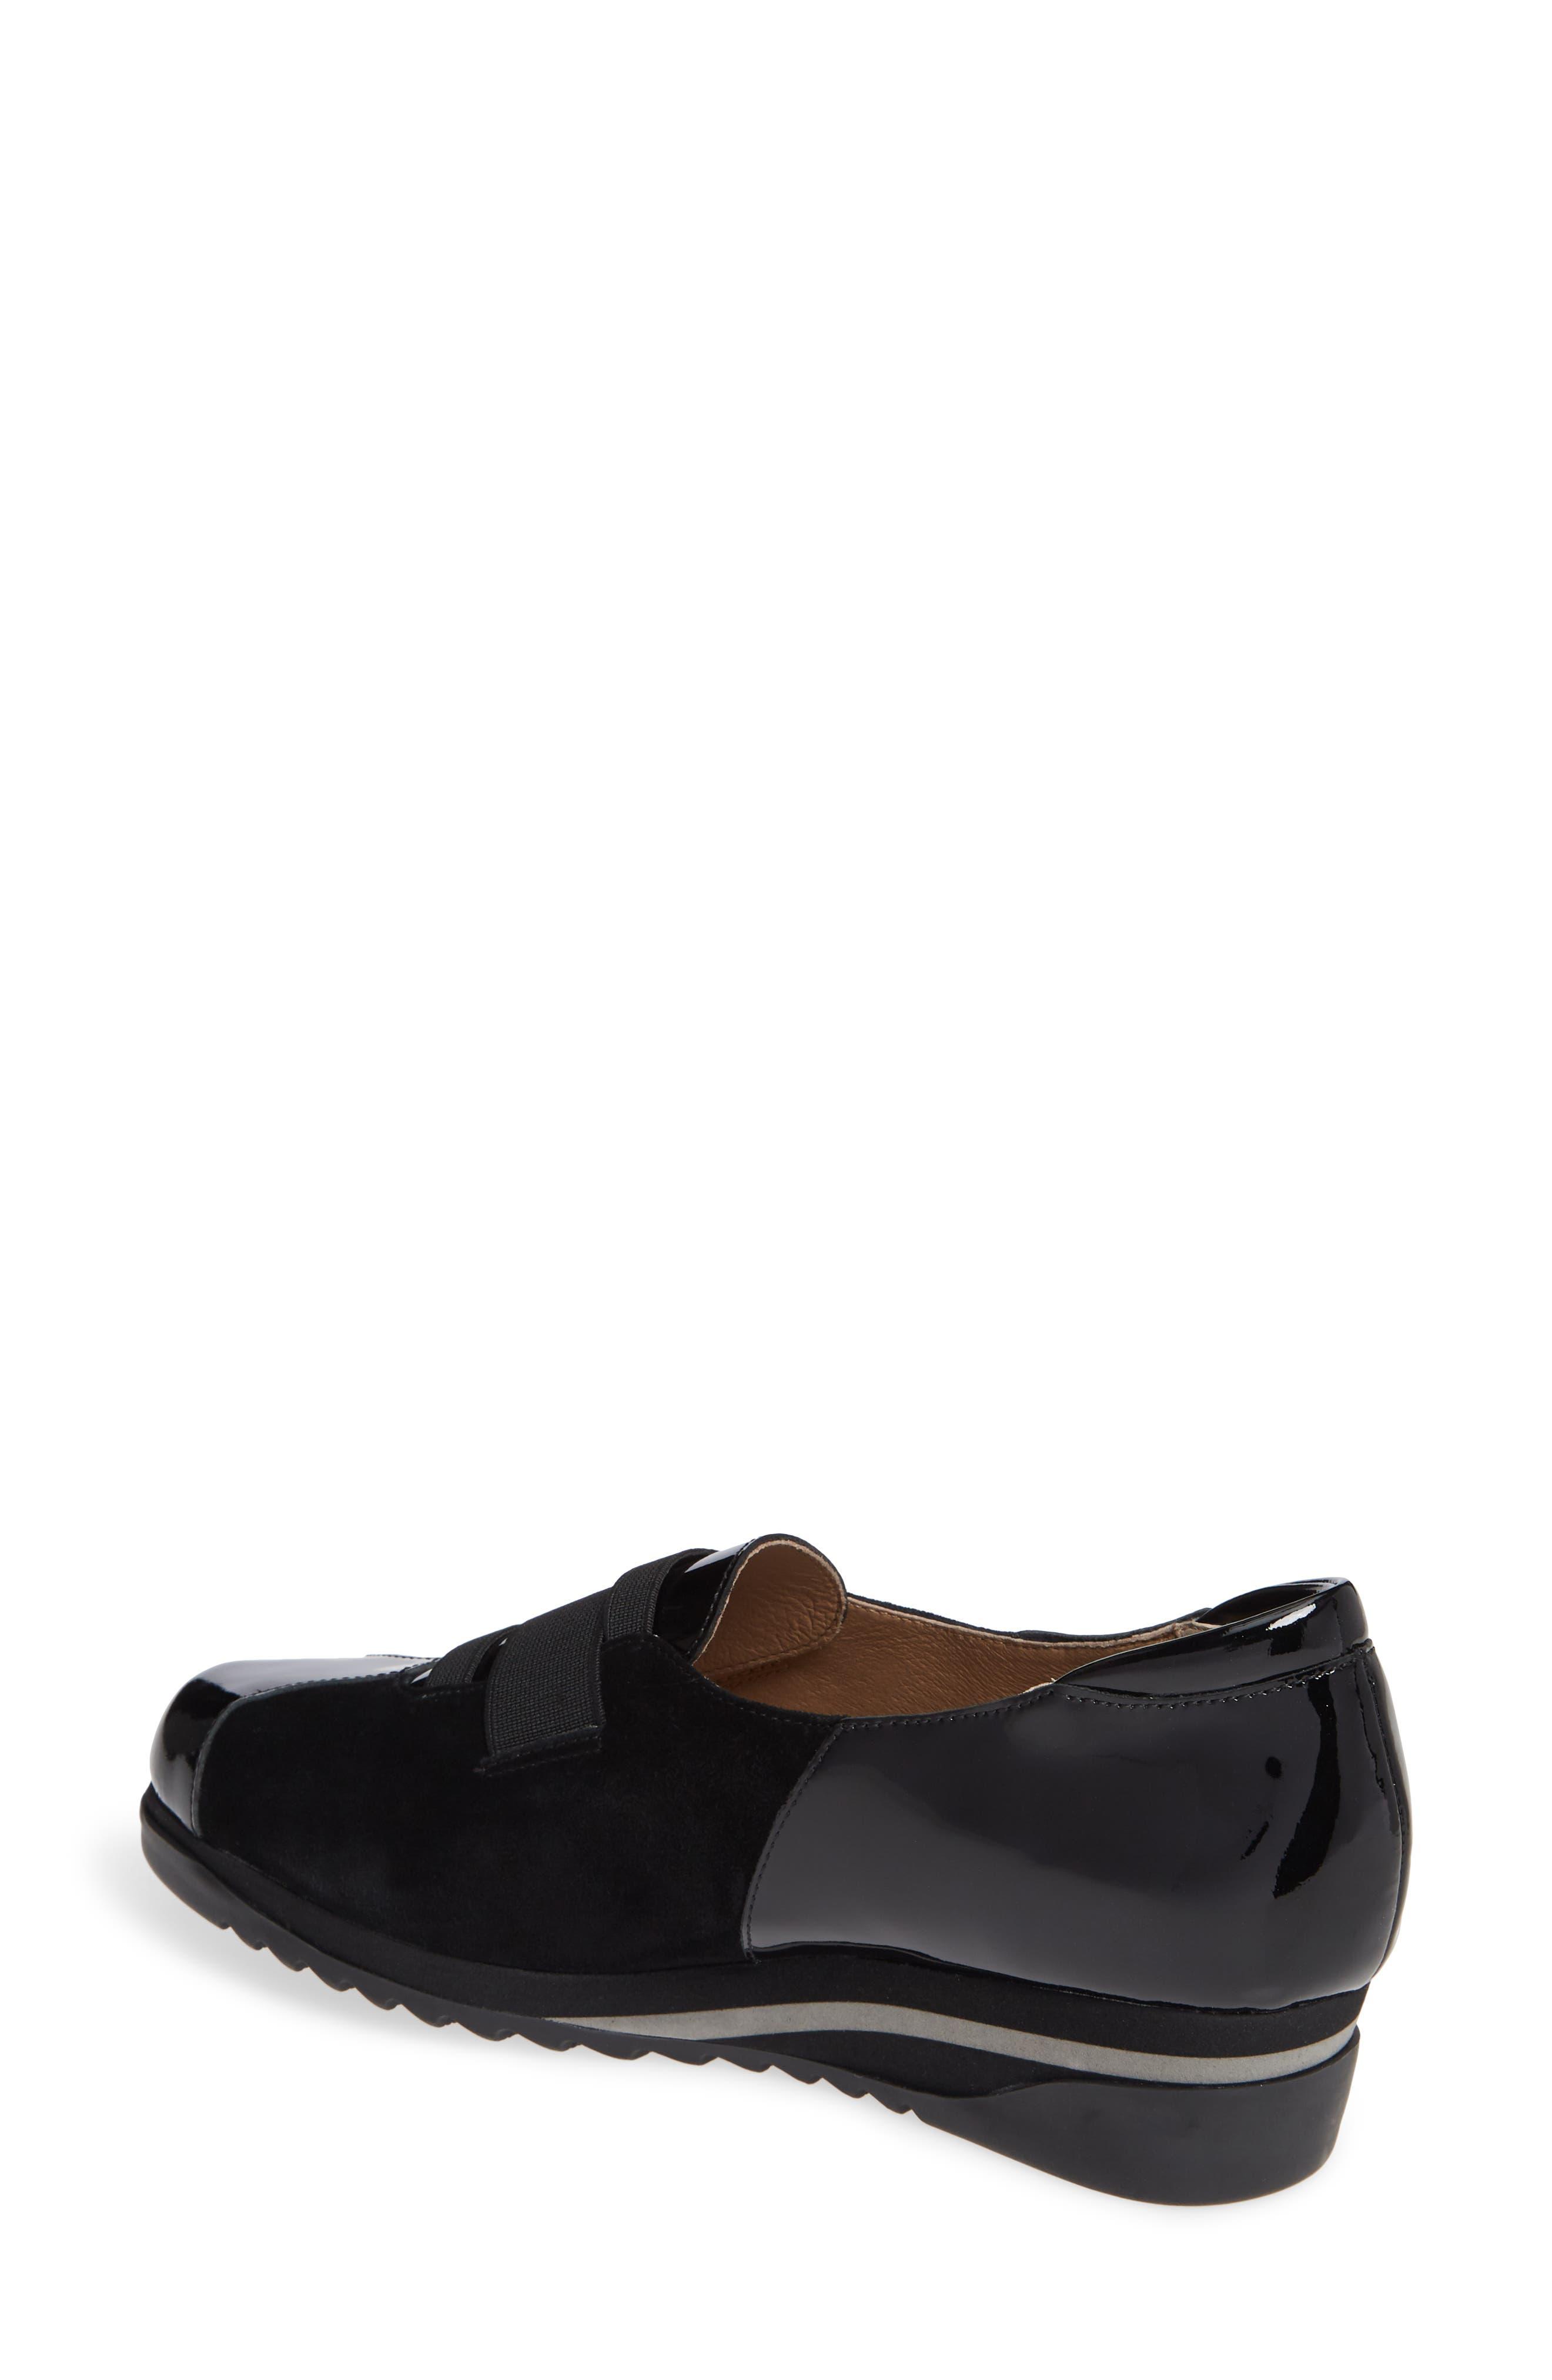 BETTYE MULLER CONCEPTS, Taytum Sneaker, Alternate thumbnail 2, color, BLACK SUEDE